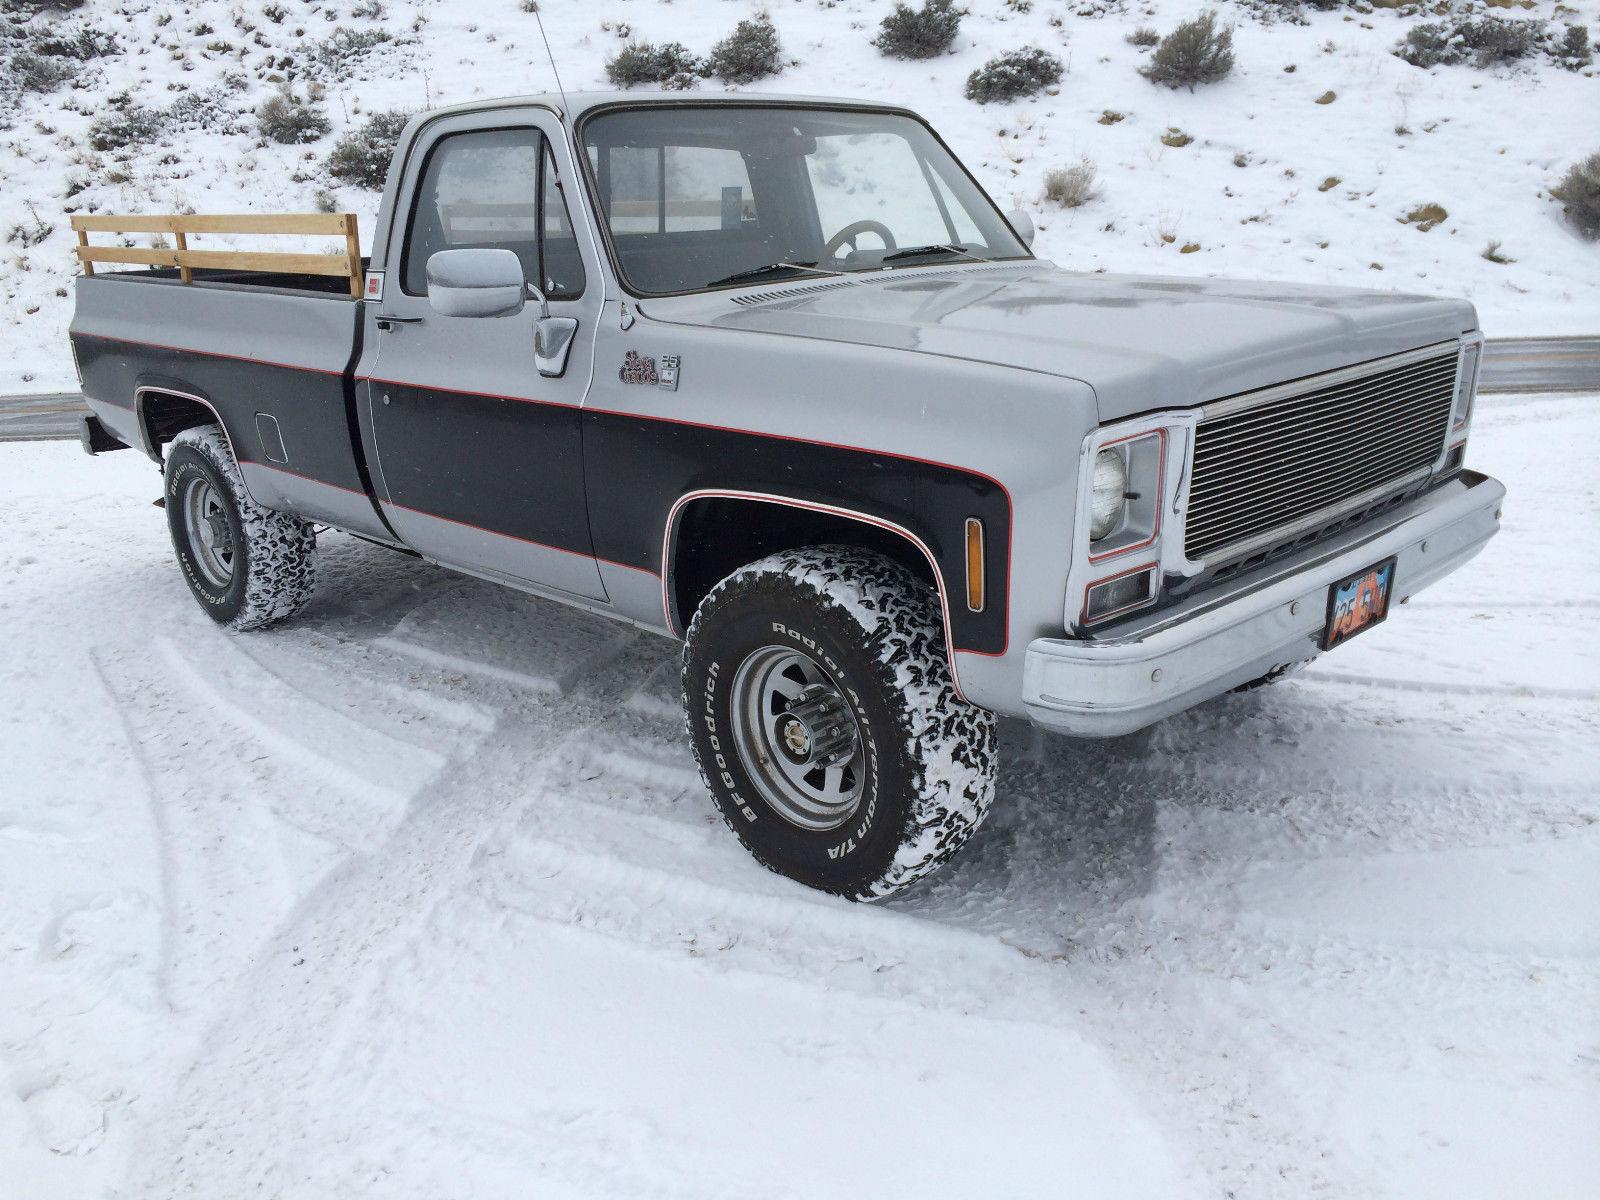 1978 gmc sierra grande 4x4   1978 78 GMC K20 3/4 ton 4x4 Four Wheel